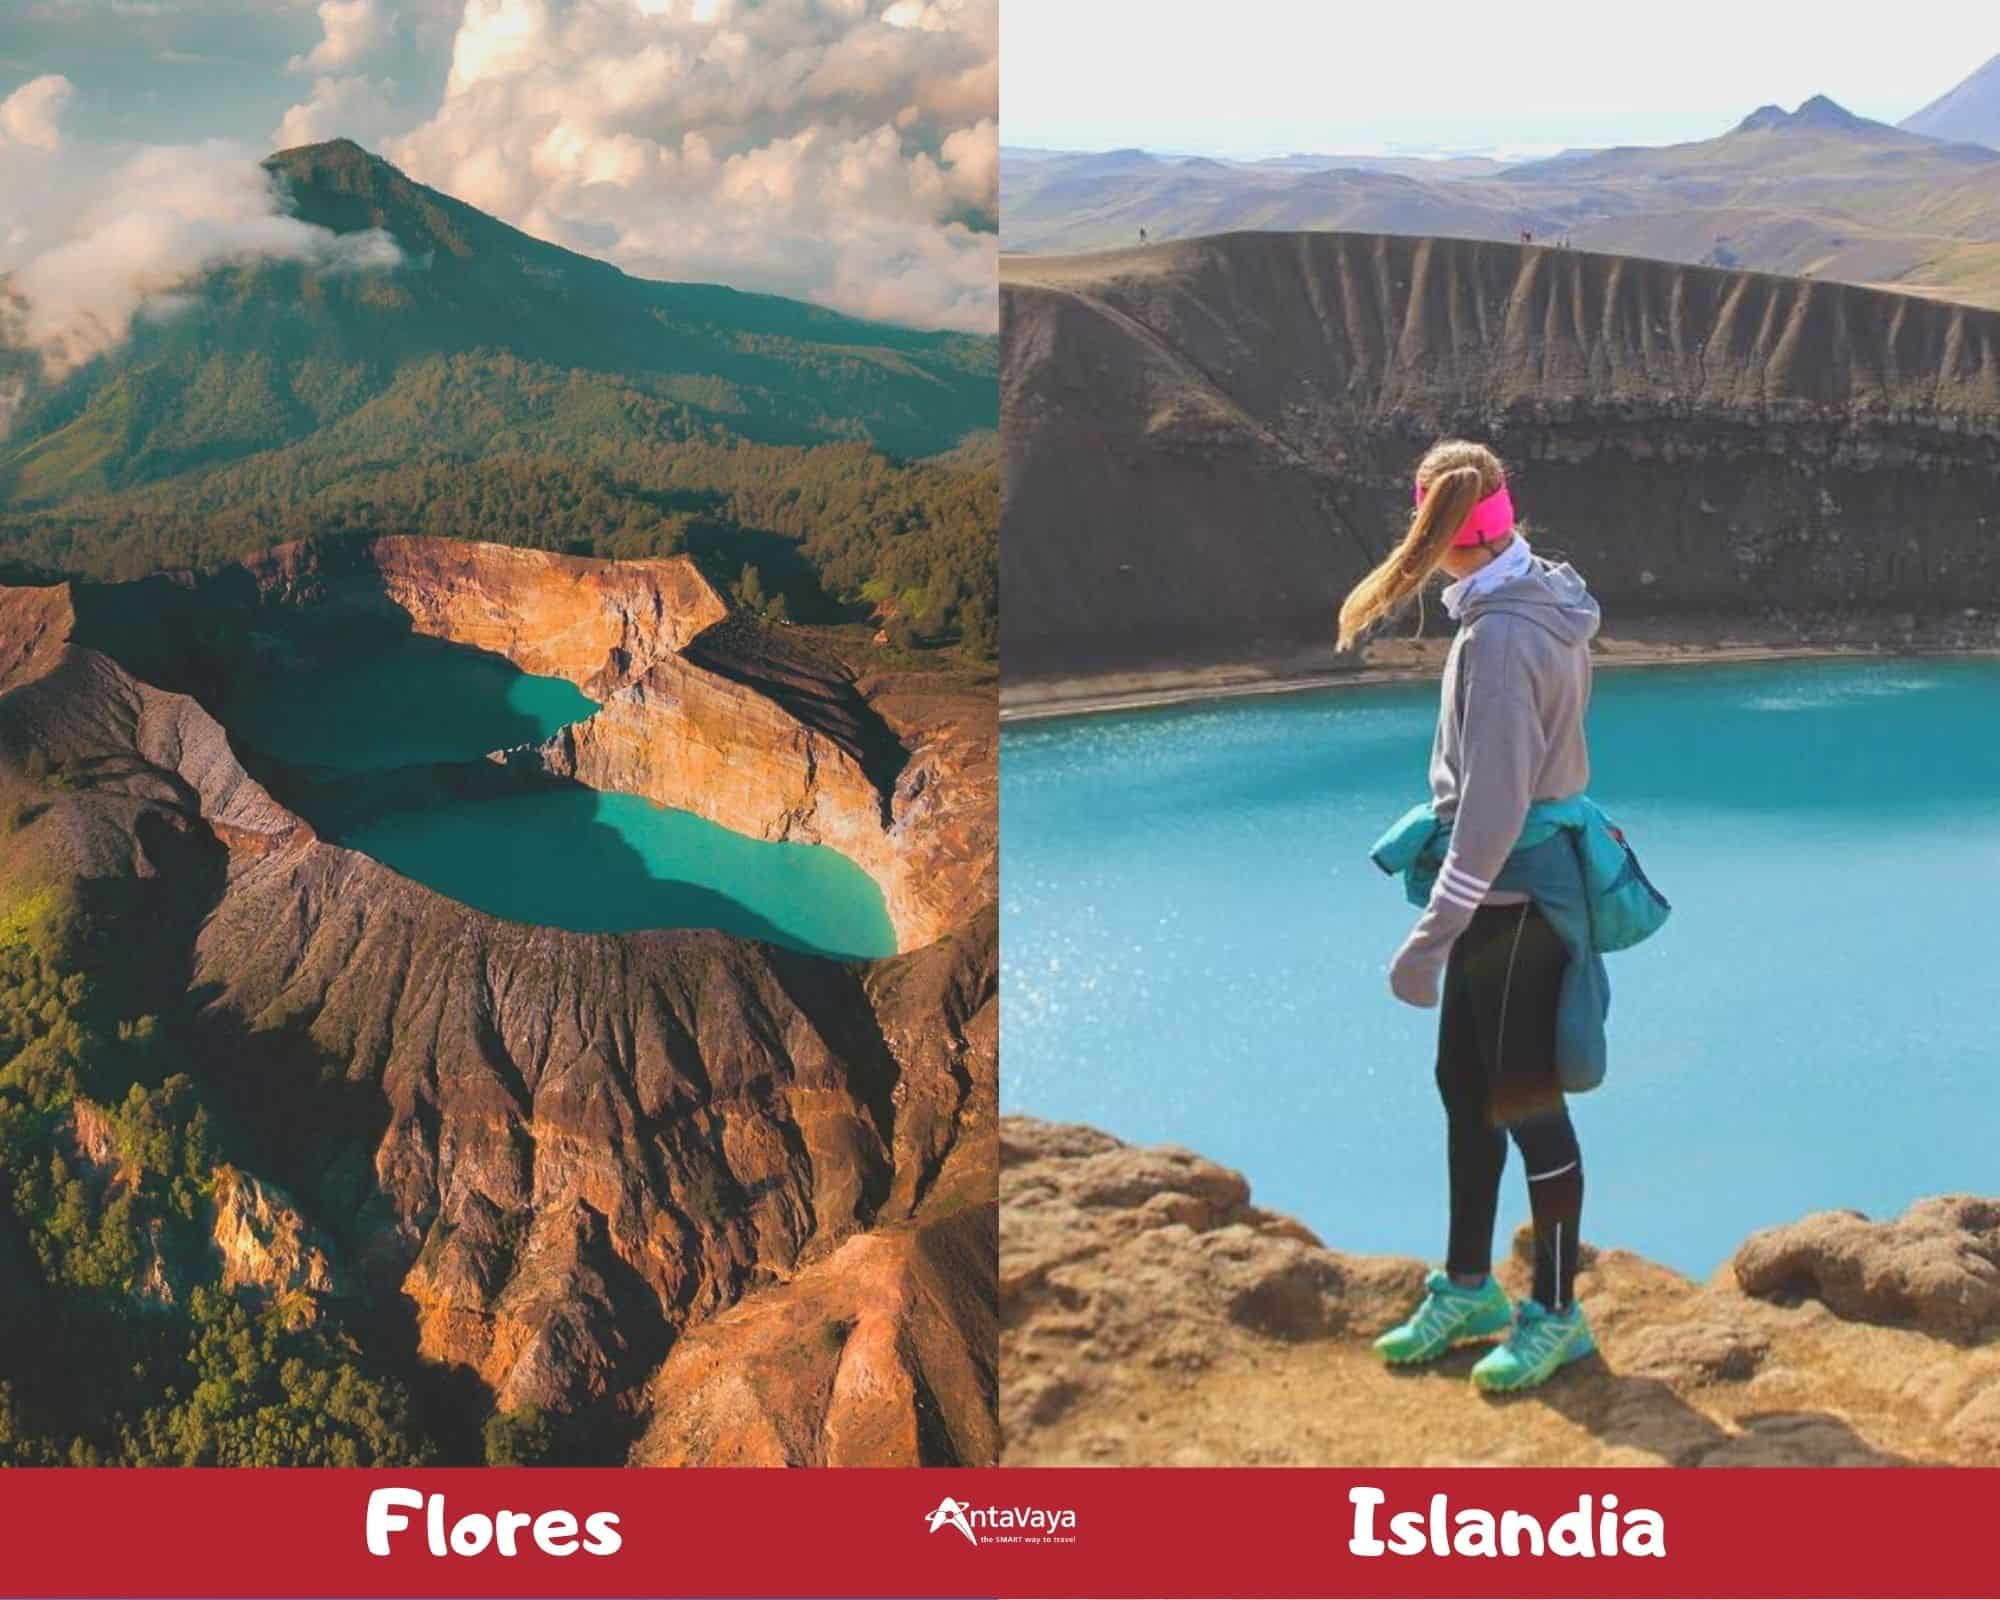 Tempat Wisata Indonesia yang Mirip Luar Negeri - Sumber Instagram thenomadnextdoor dan nicolaschafroth